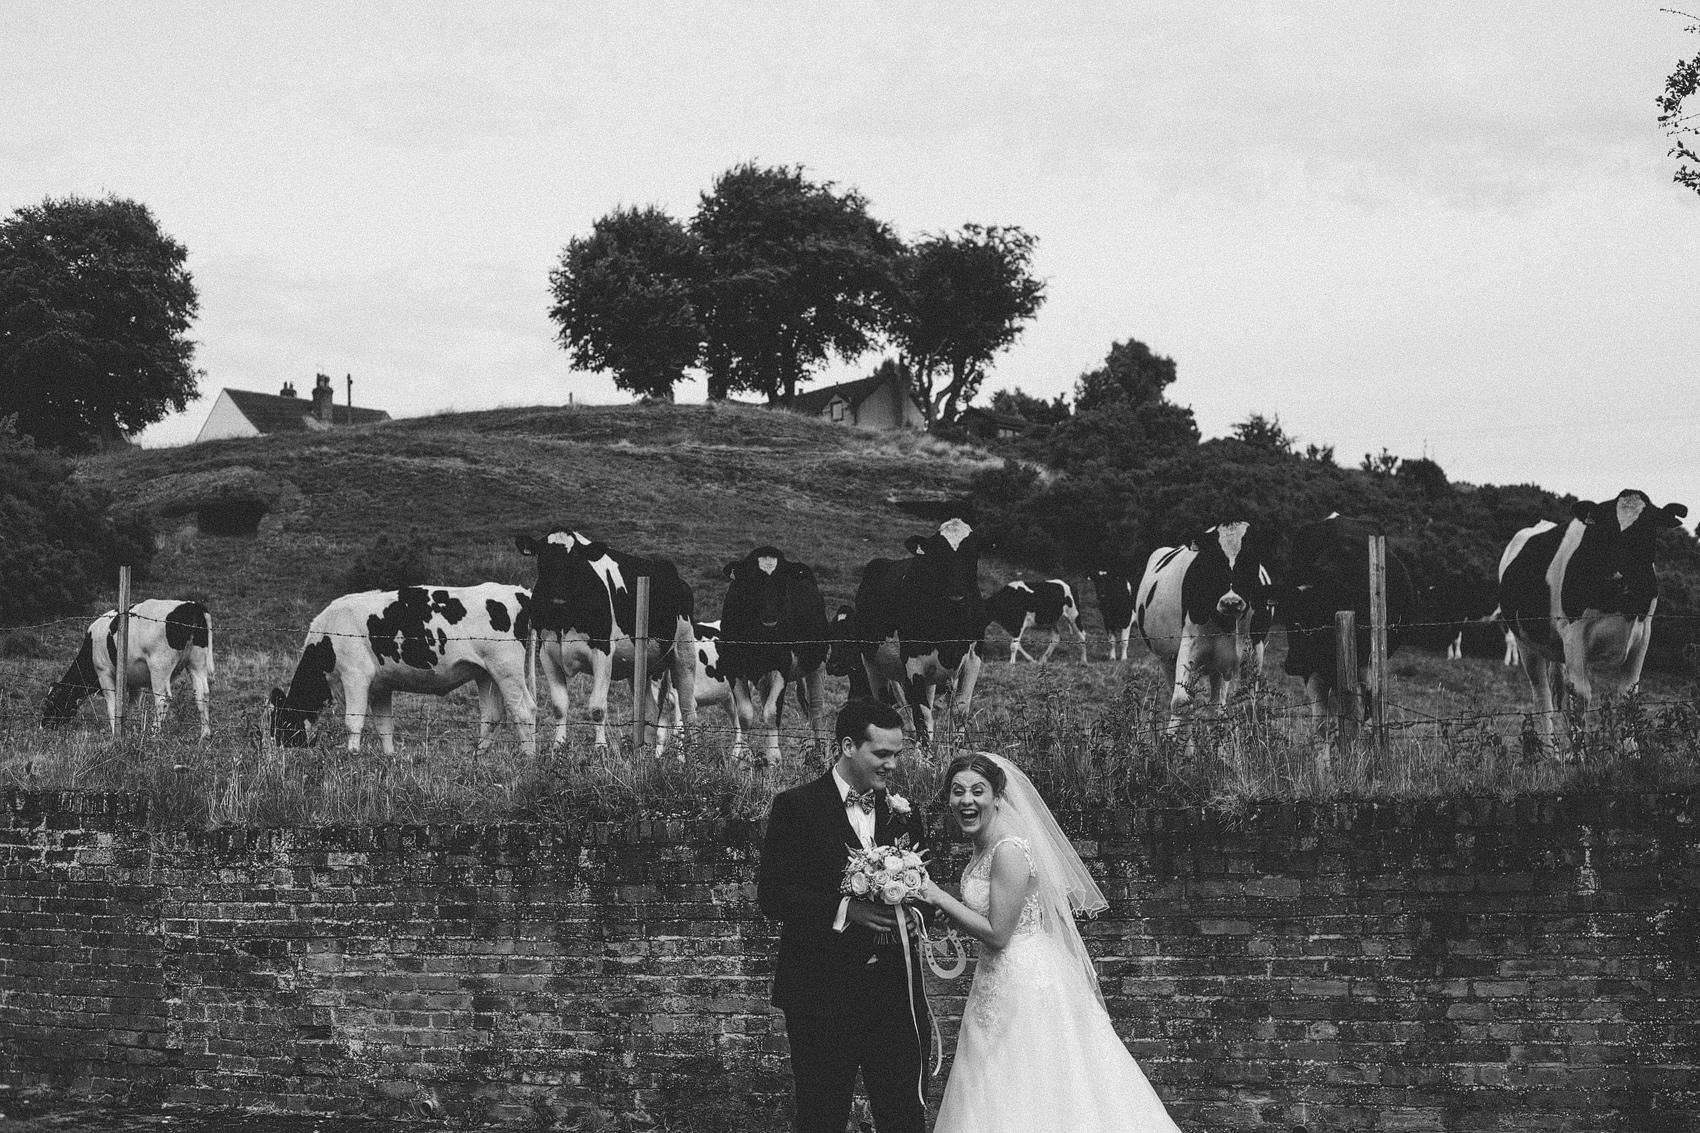 Dilhorne_Village_Hall_Wedding_Photography_-_24_.jpg